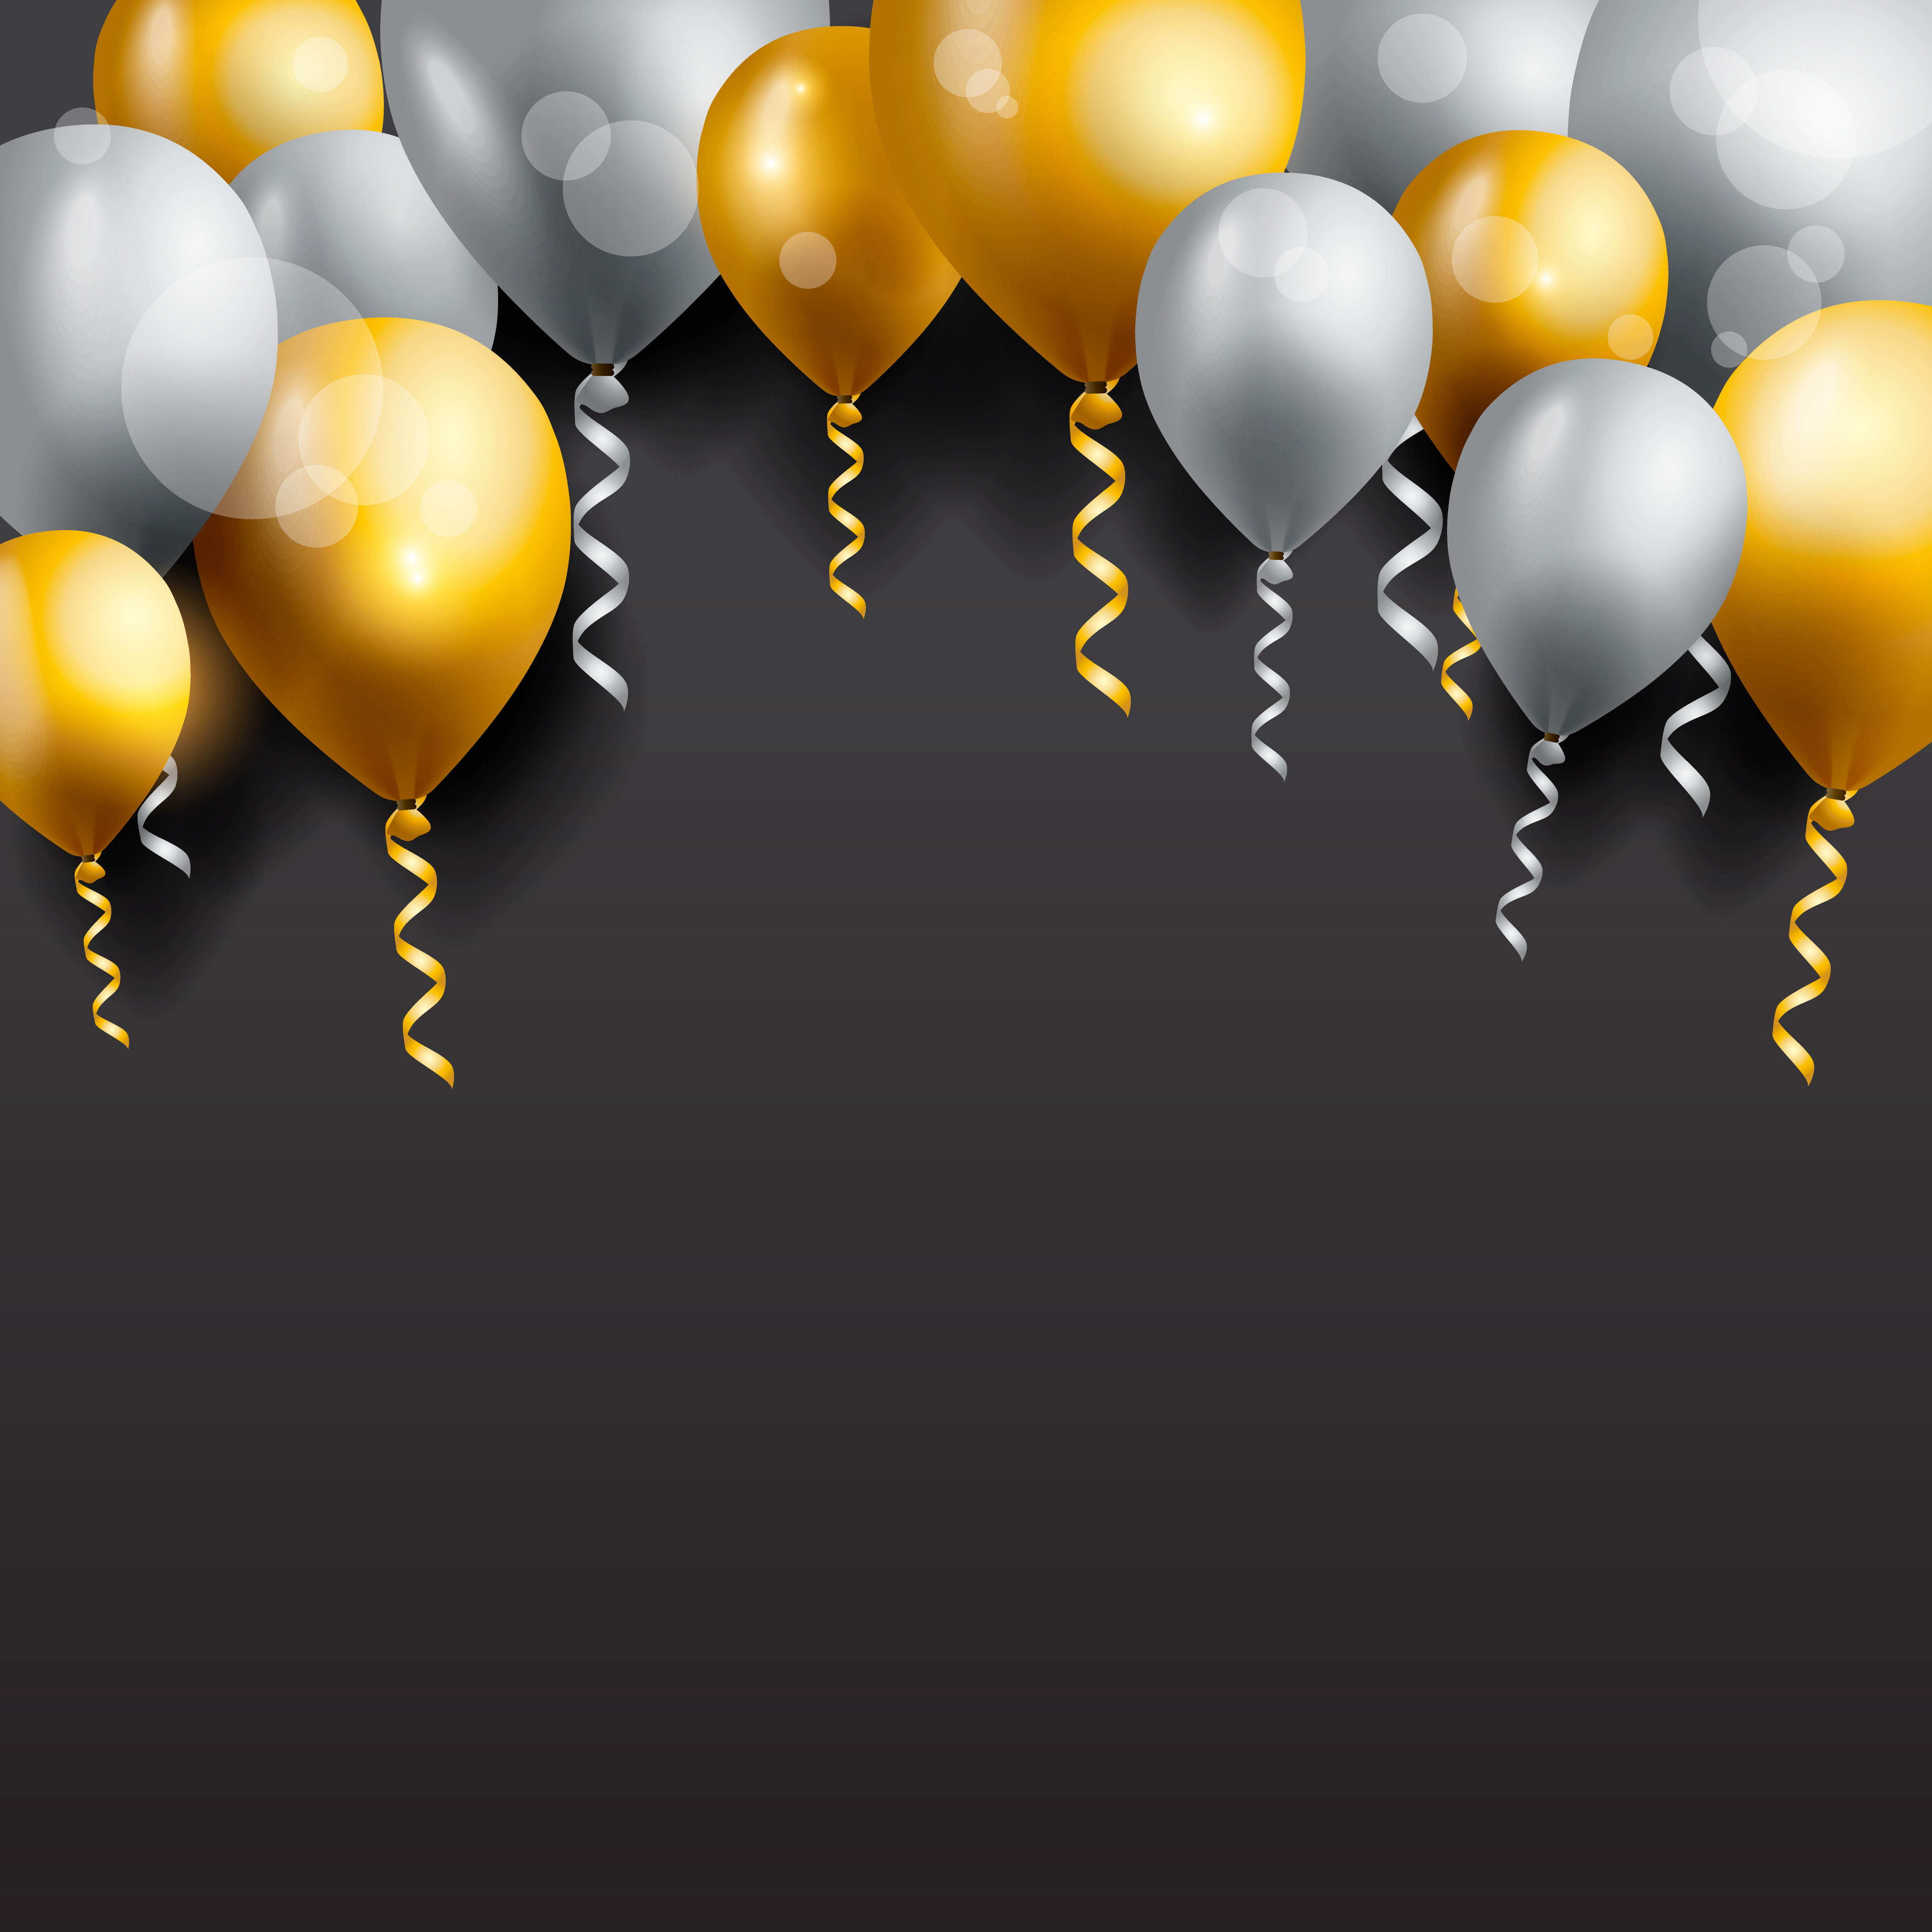 birthday celebration background, birthday balloon wallpaper 20 ...